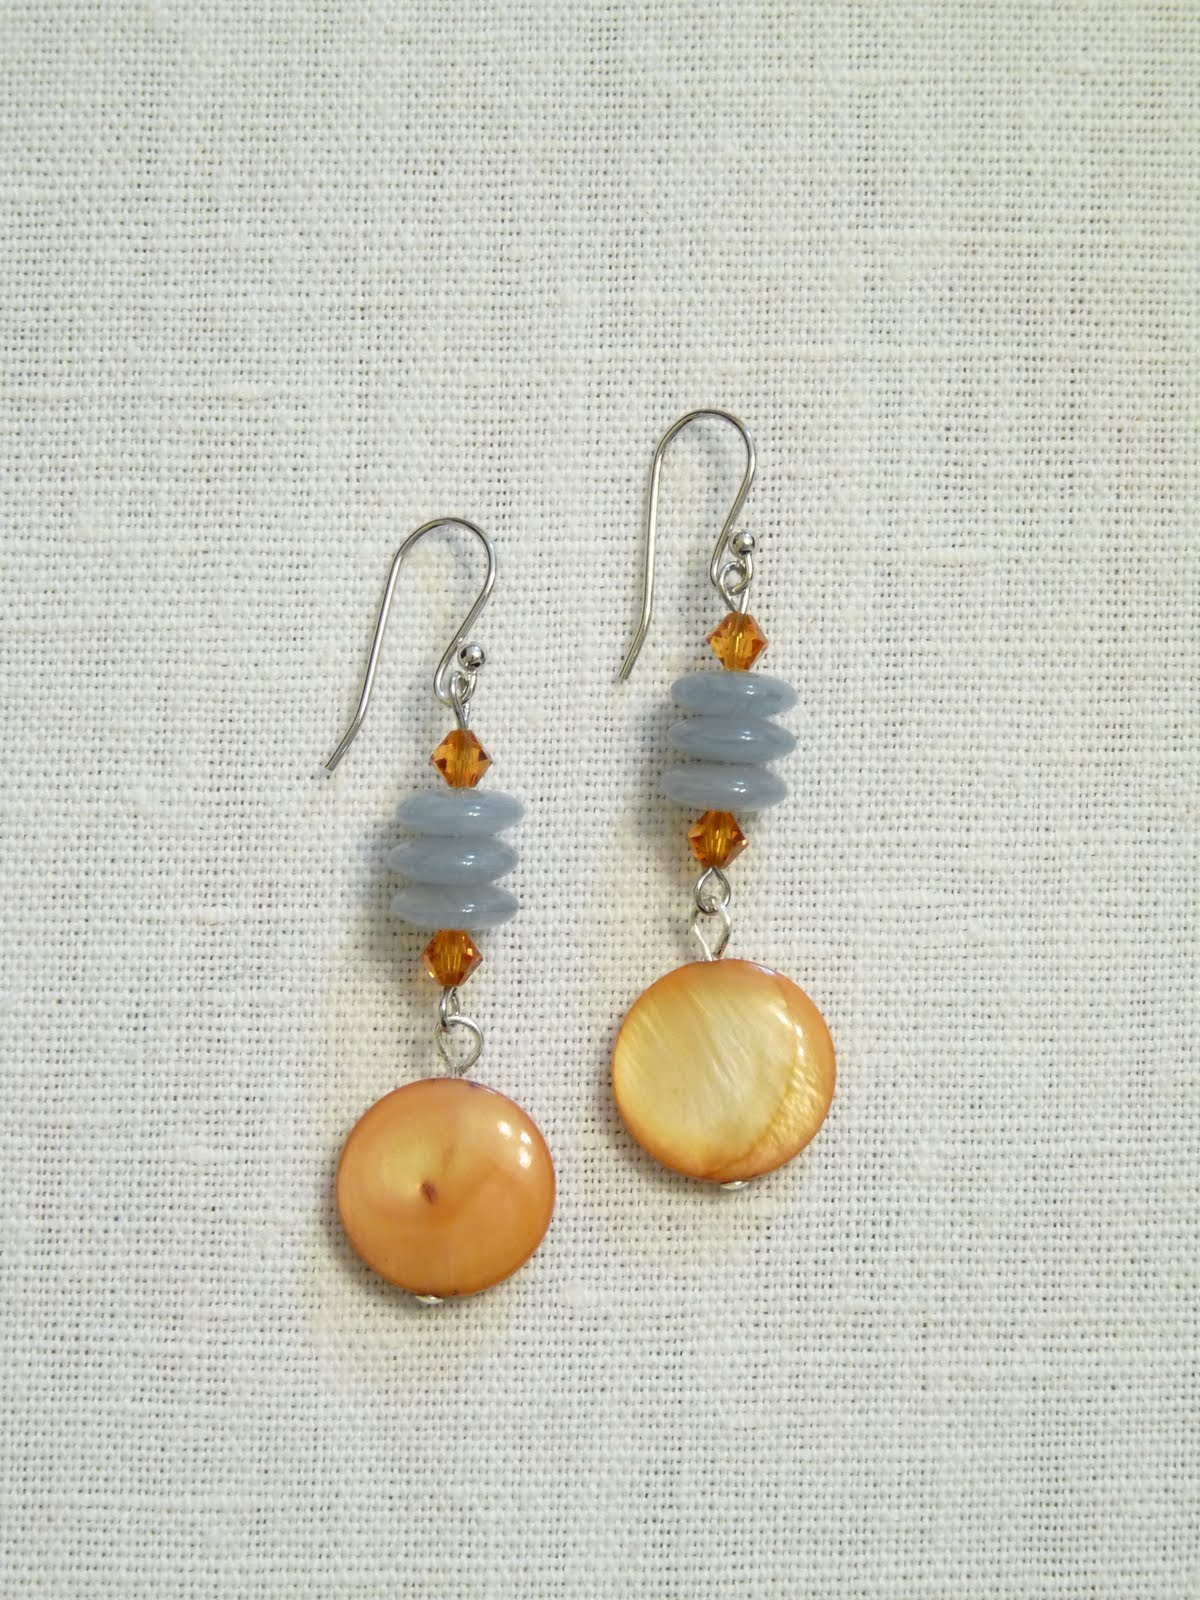 DIY Beaded Earrings | 15 Beautiful Handmade Mother's Day Gift Ideas